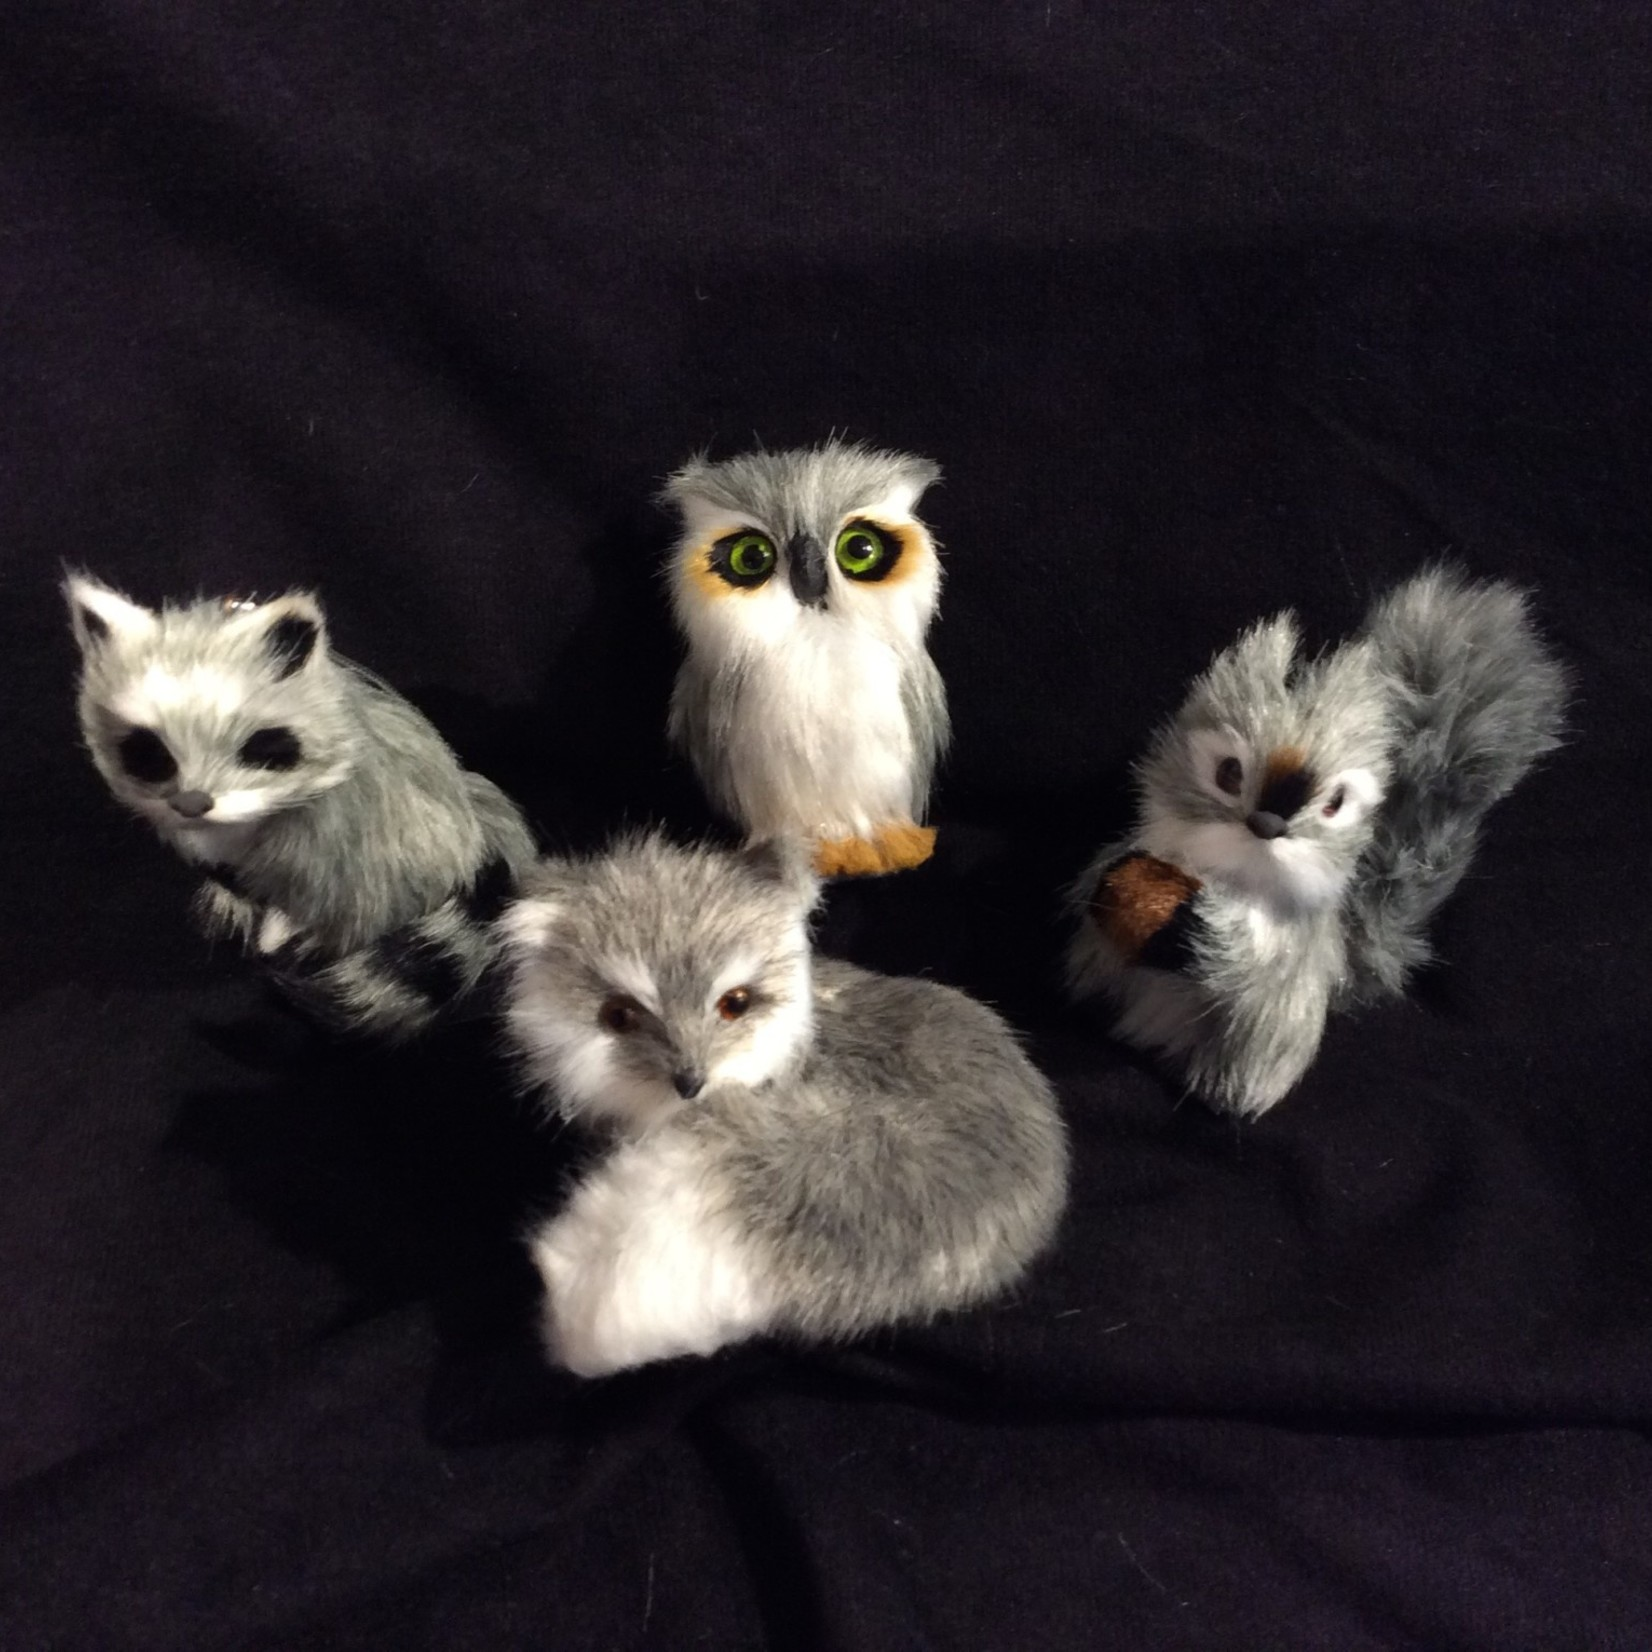 **Furry Gray Animal Orn. 4A